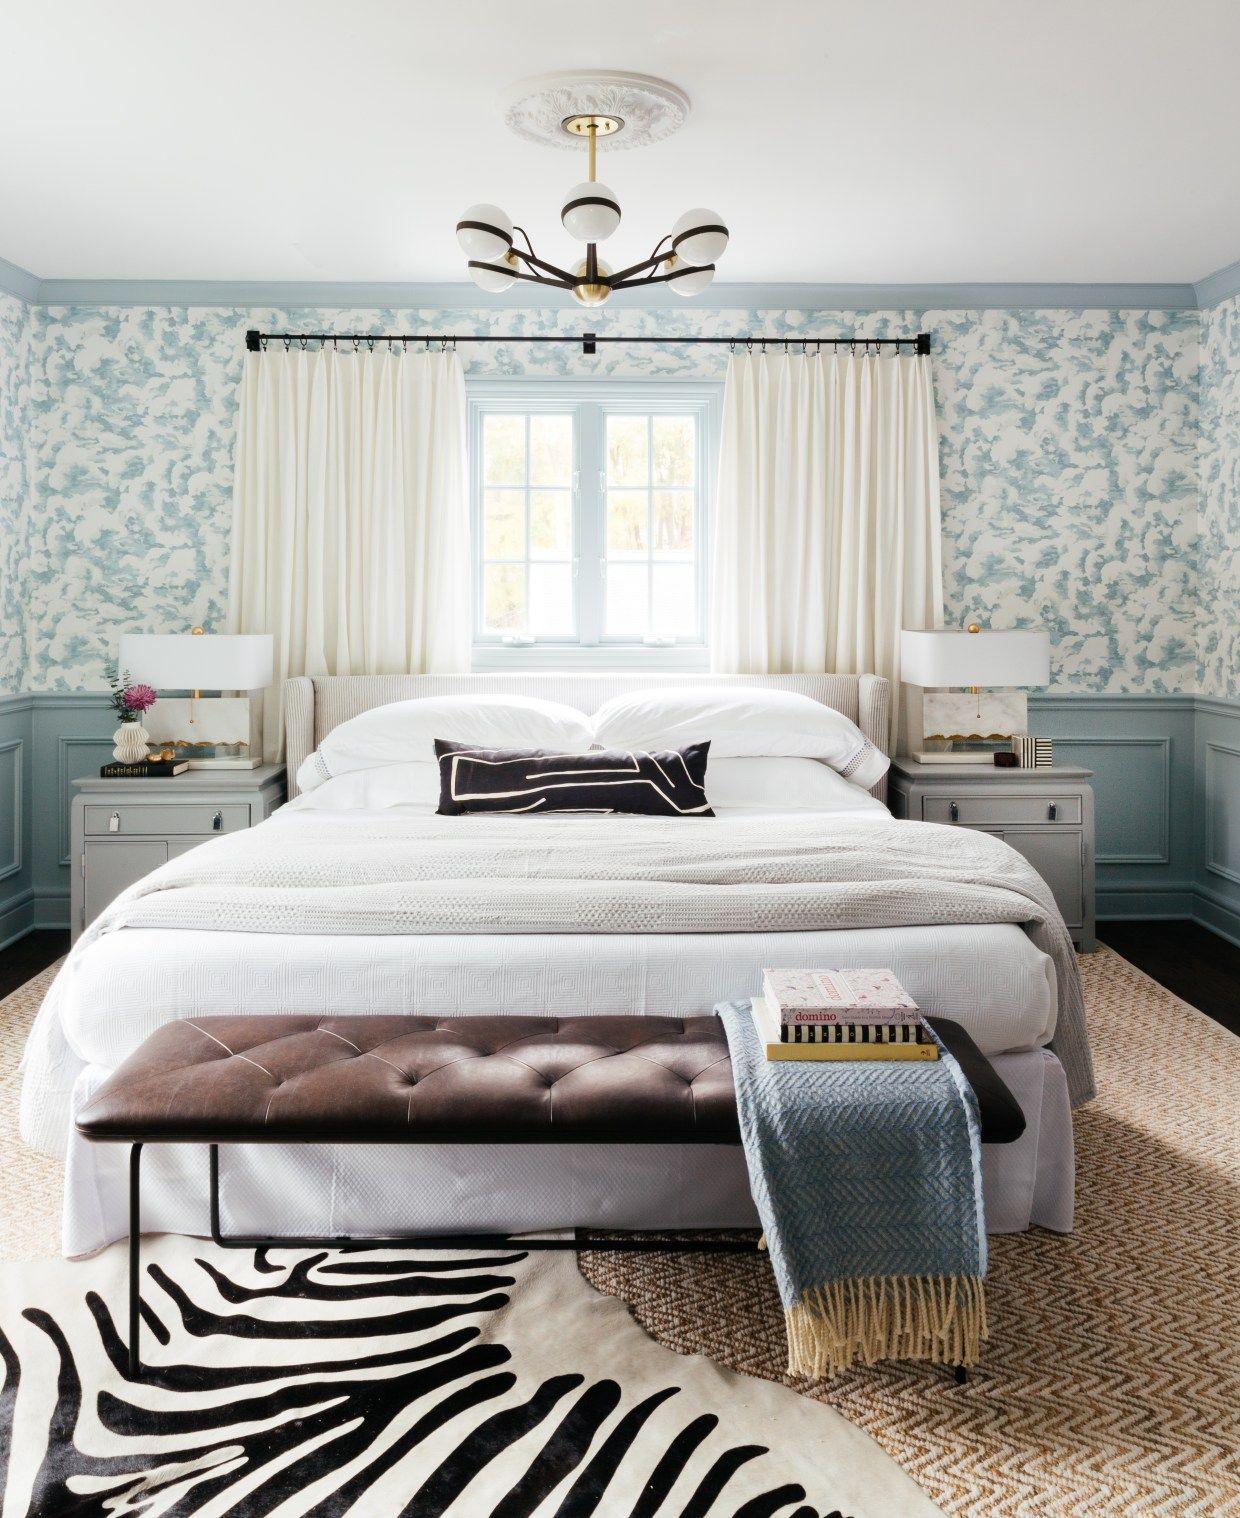 Beautiful Master Bedroom Decorating Ideas 62: Stunningly Beautiful Master Bedroom With Lots Of Diy's